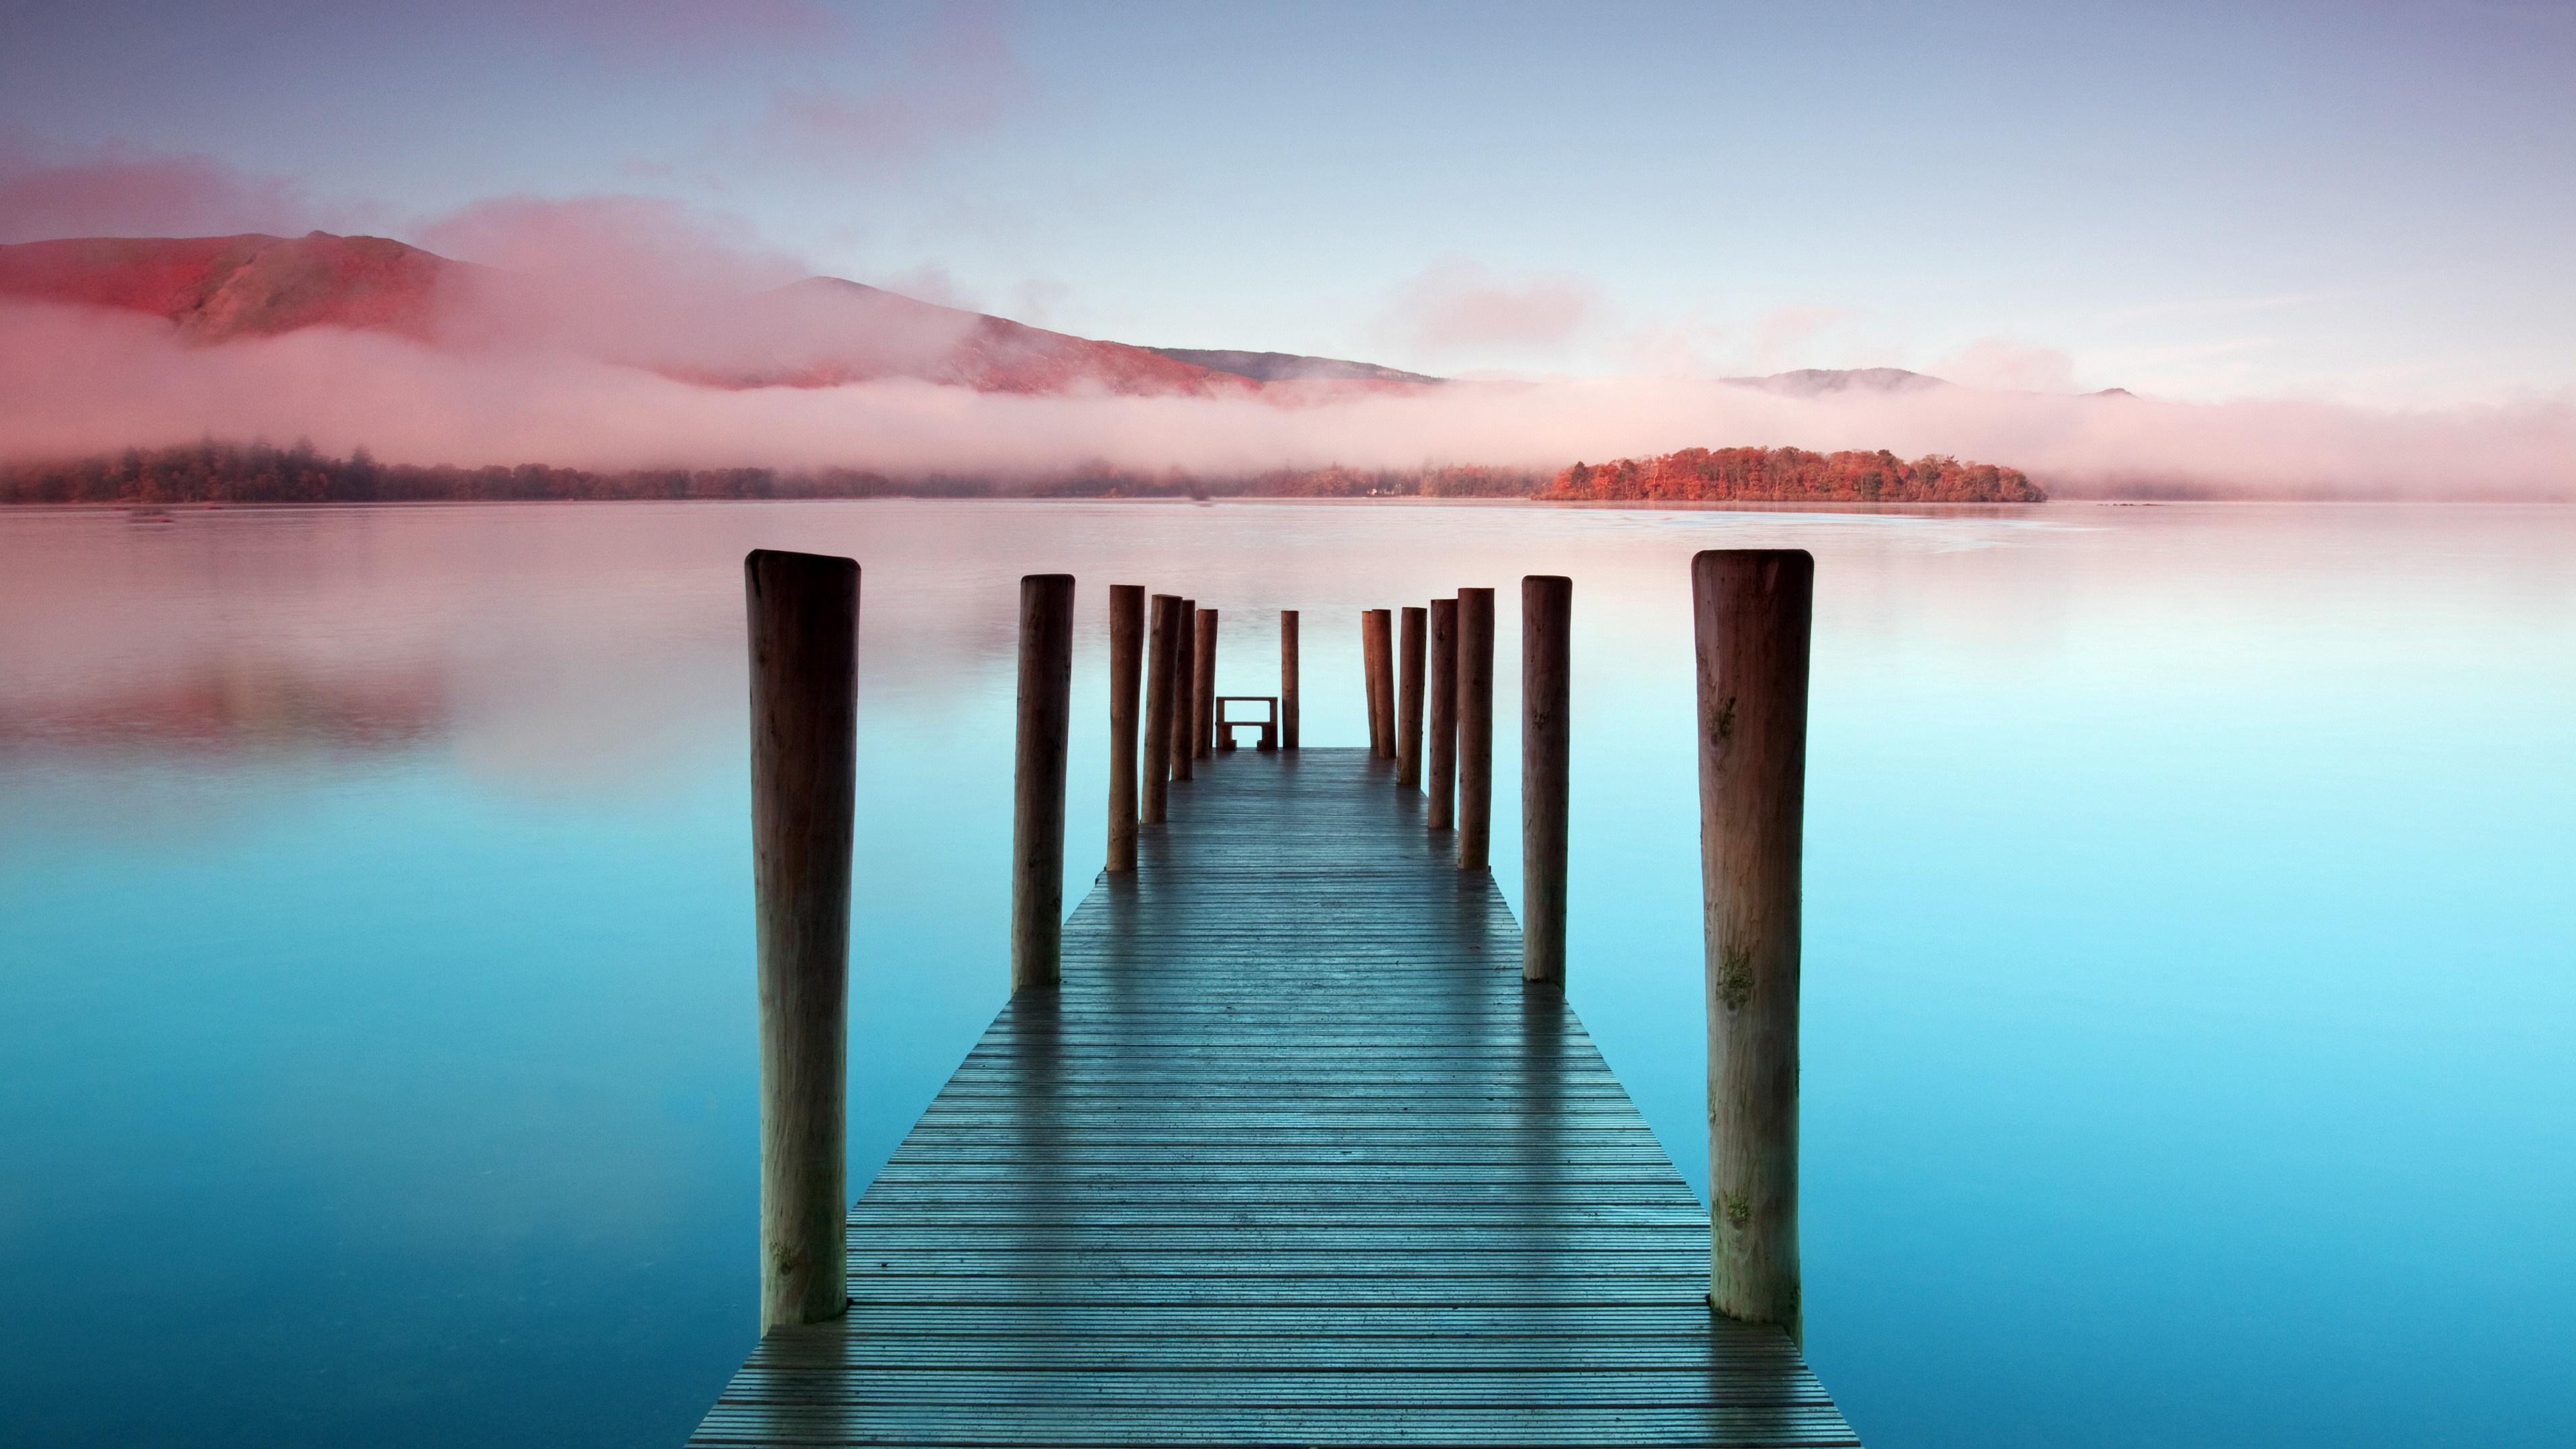 Ashness Pier over Lake Windermere (England) wallpaper